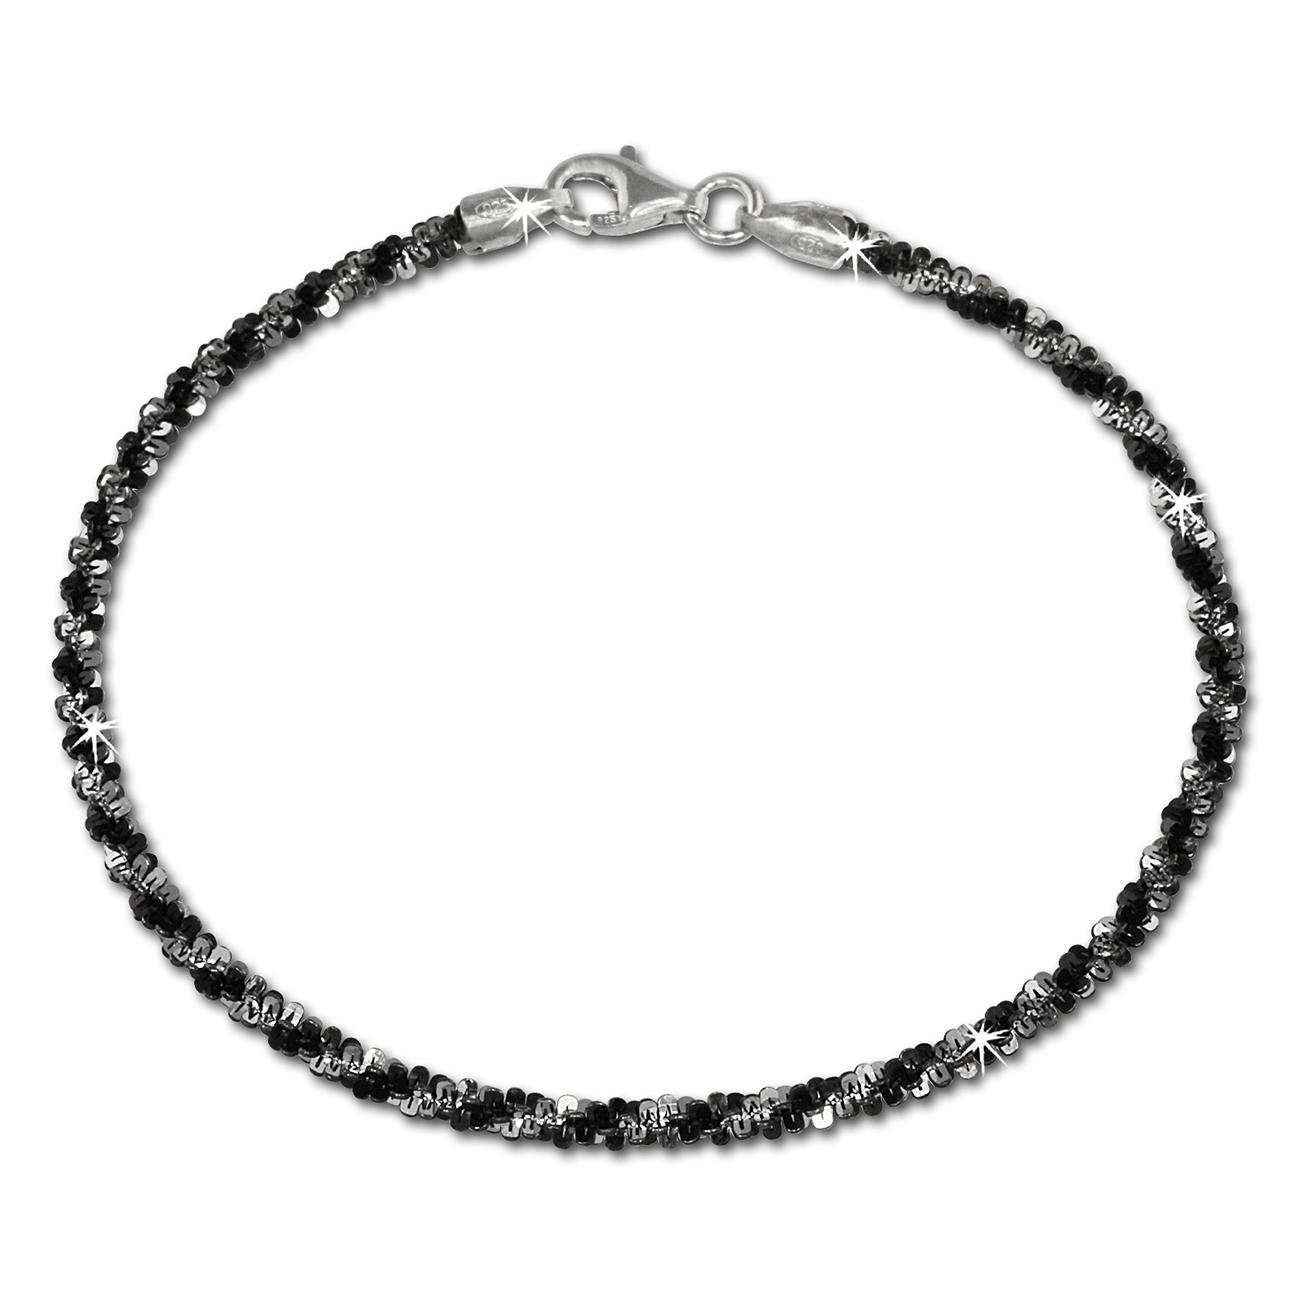 silberdream armband gedreht schwarz 20cm 925 silber damen. Black Bedroom Furniture Sets. Home Design Ideas